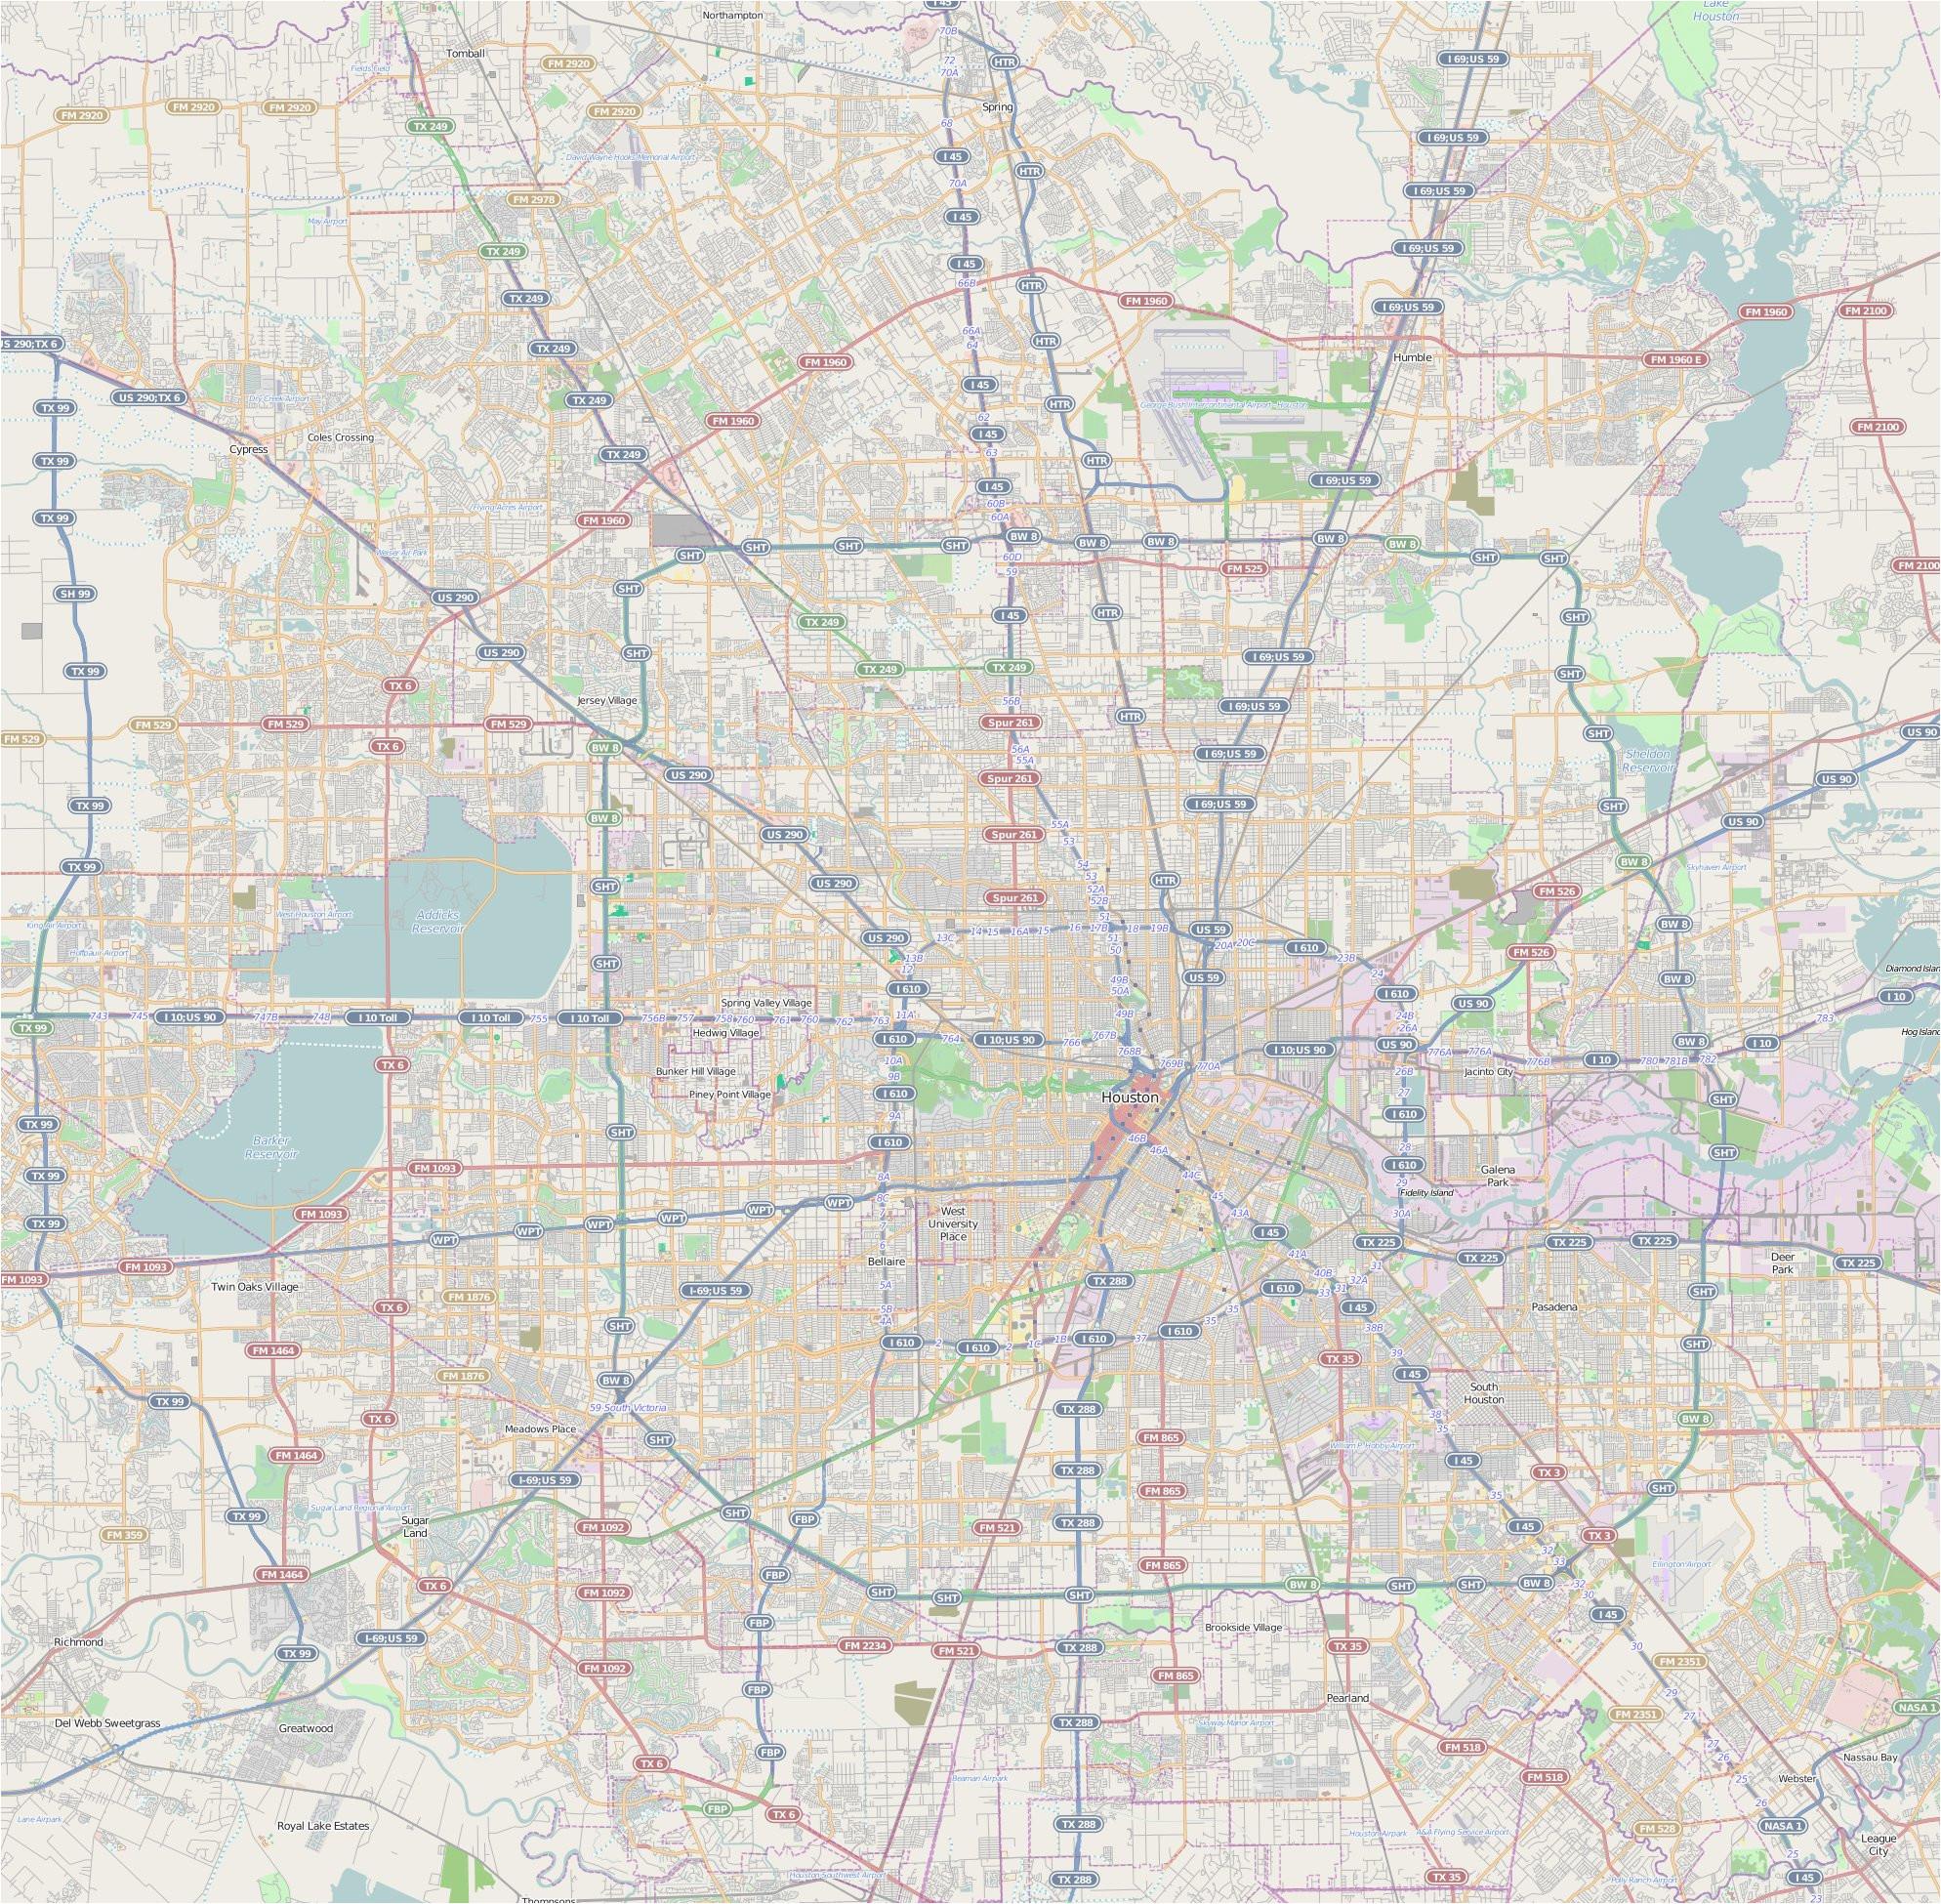 Map to Houston Texas File Map Houston Jpg Wikimedia Commons